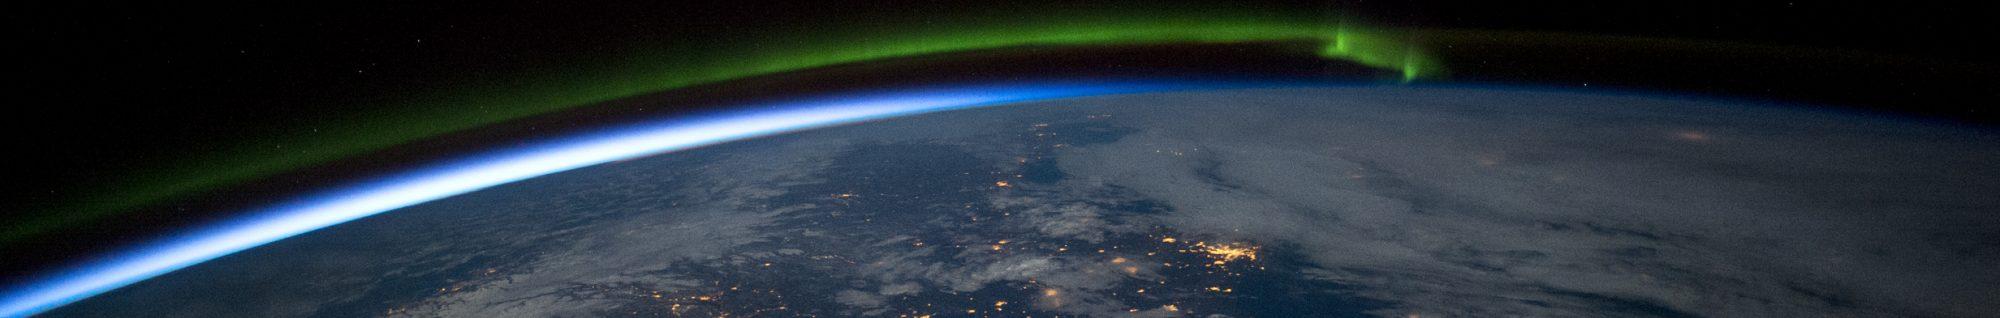 Planetary Sustainability / Planetare Nachhaltigkeit